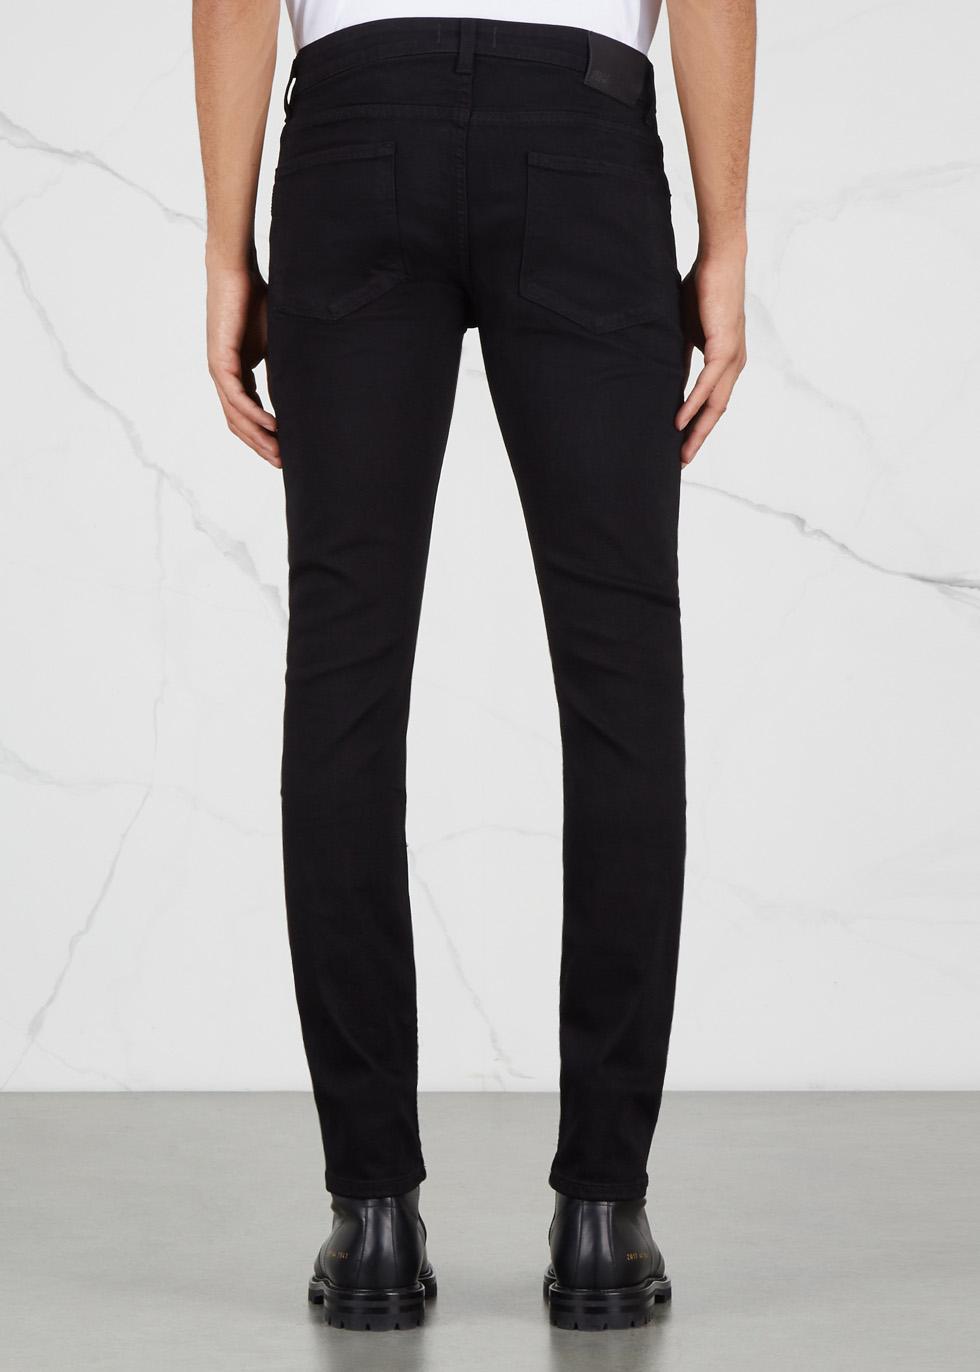 Croft black skinny jeans - Paige